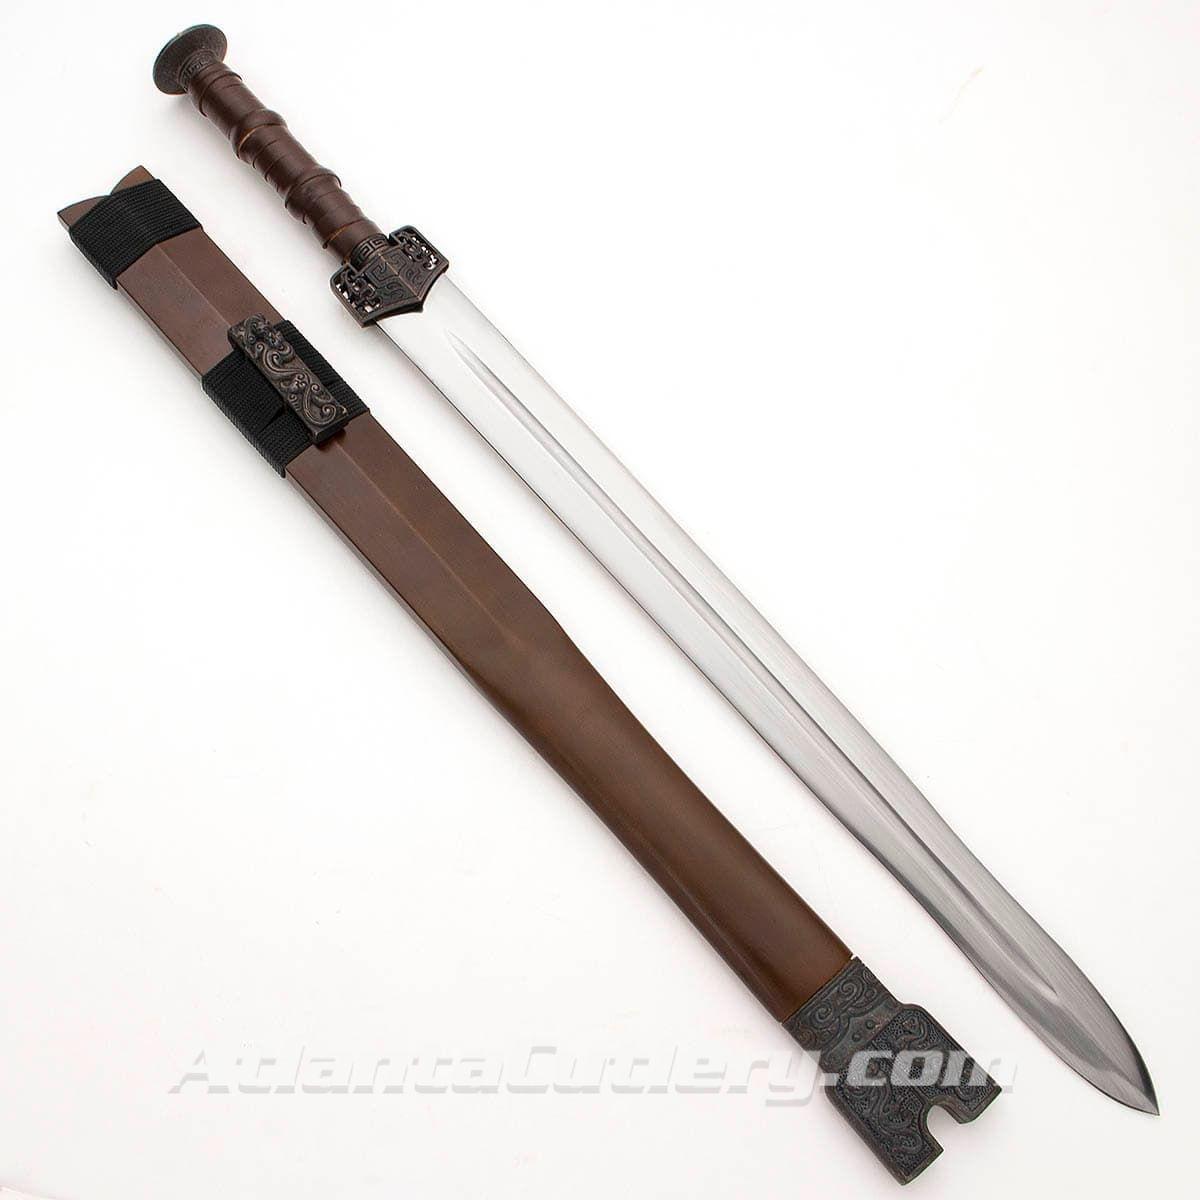 Han War Sword with Wood Scabbard